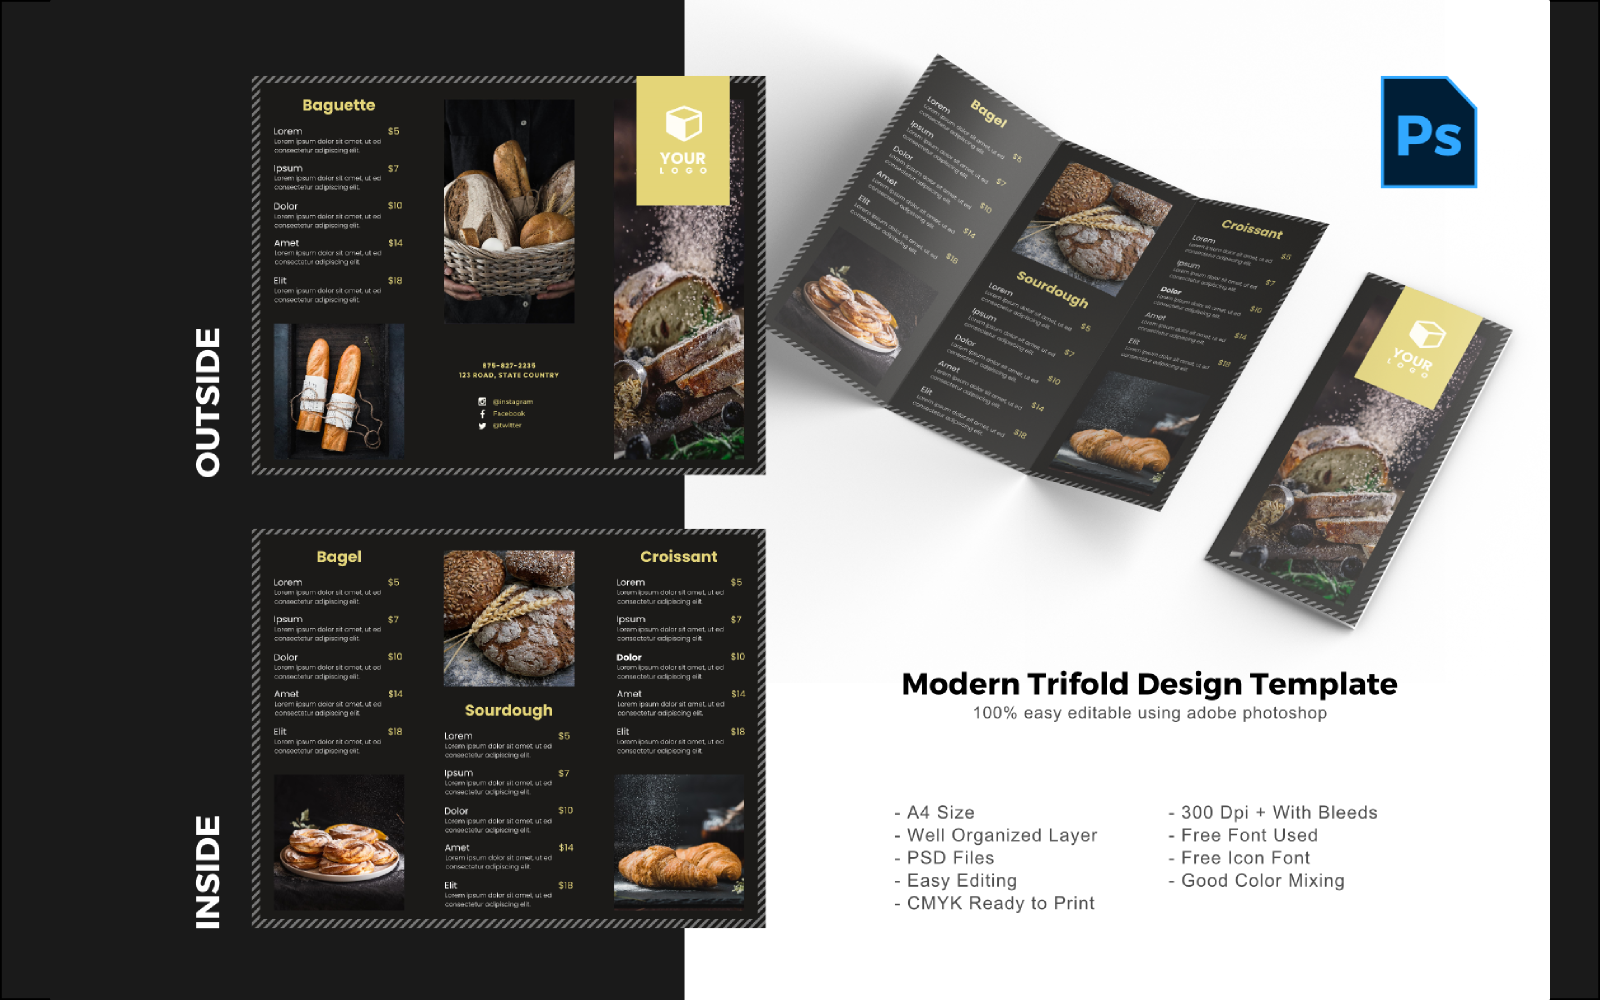 Luxury Bakery Trifold Brochure PSD sablon 150203